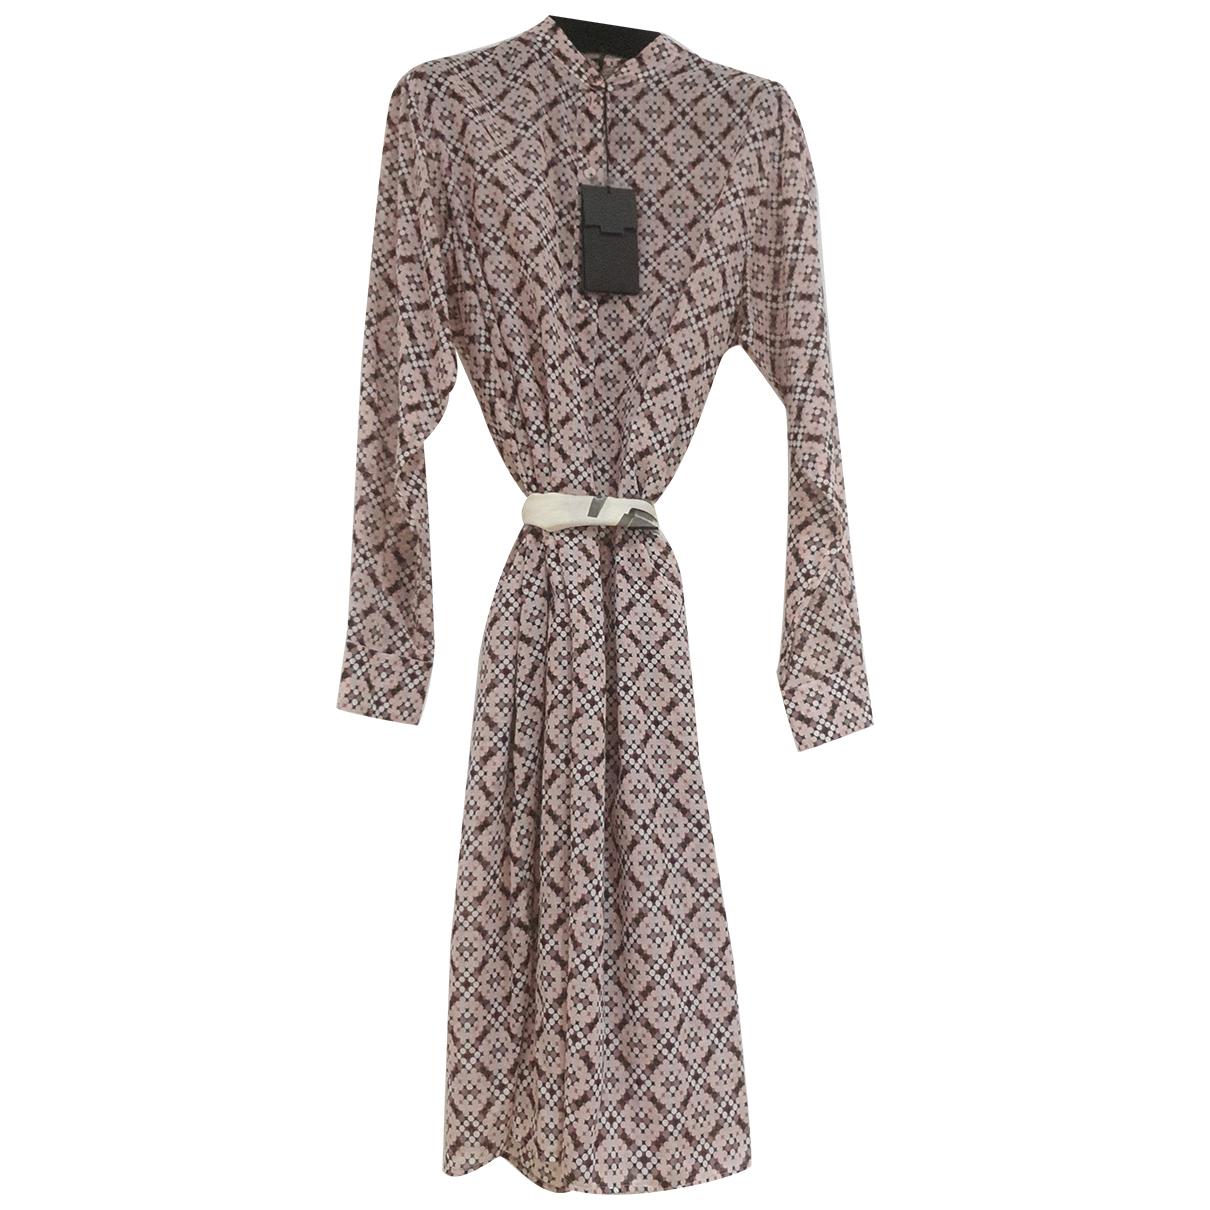 Bottega Veneta N Multicolour Cotton dress for Women 42 IT